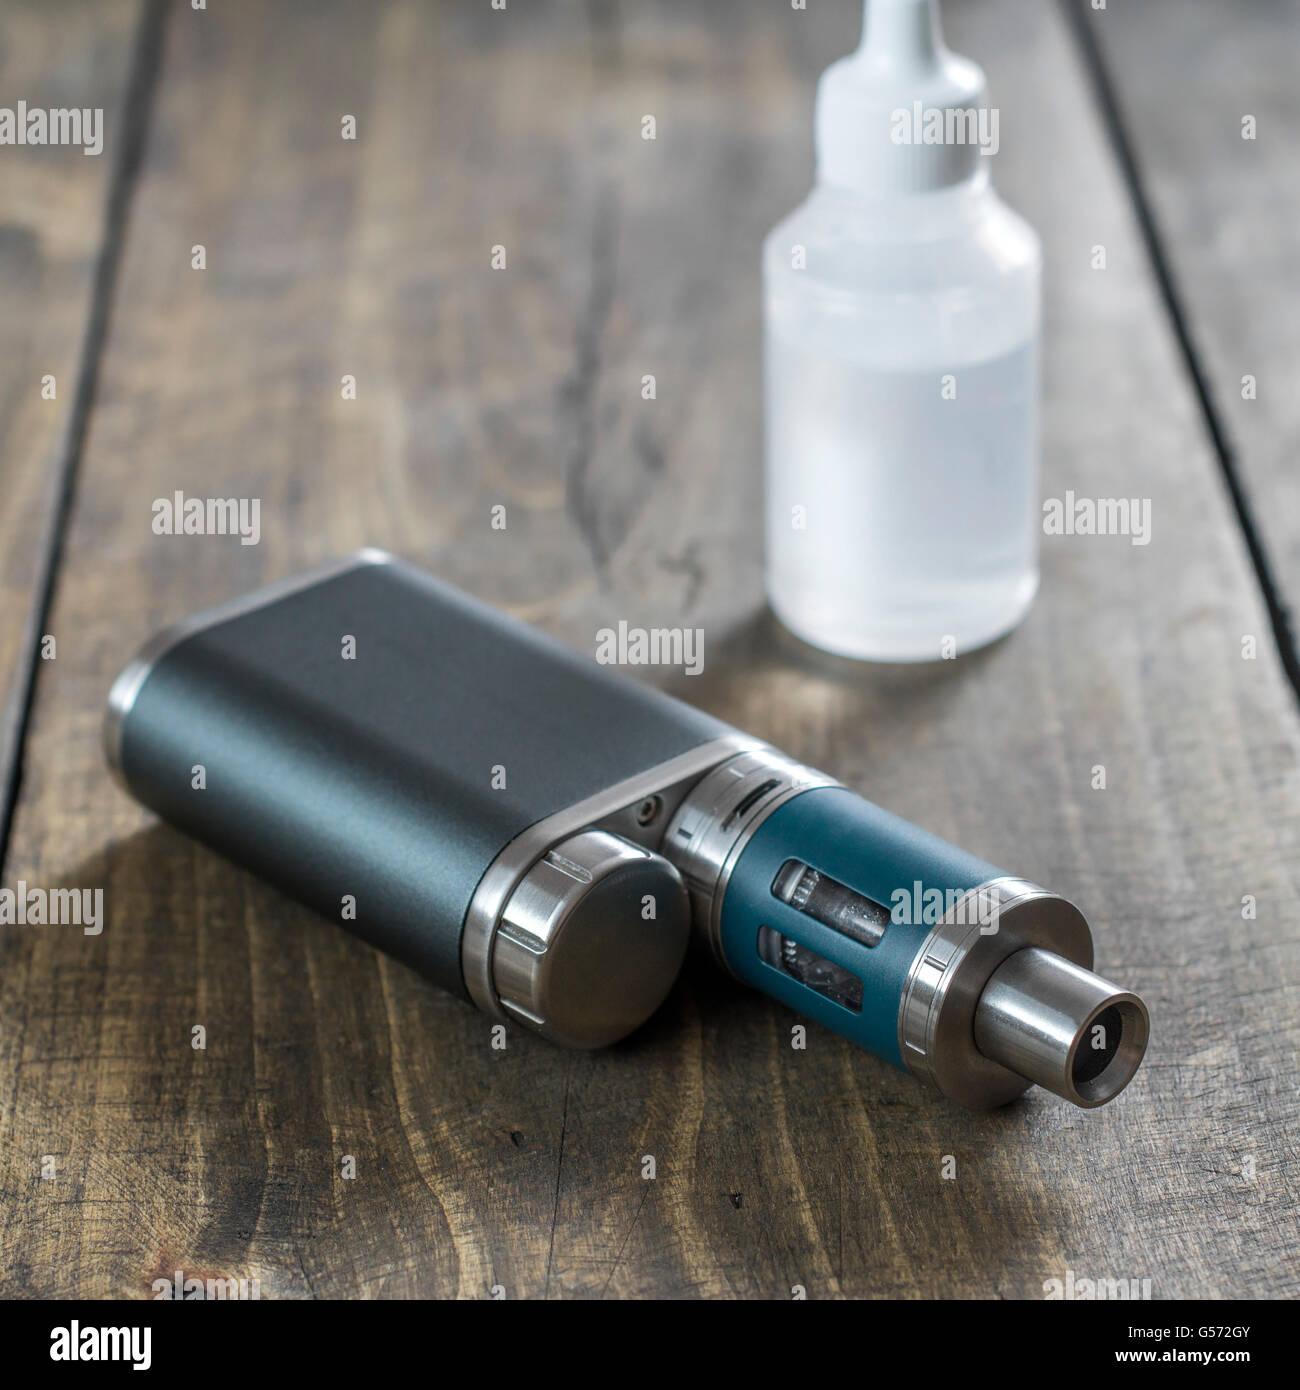 Advanced personal vaporizer or e-cigarette, close up - Stock Image